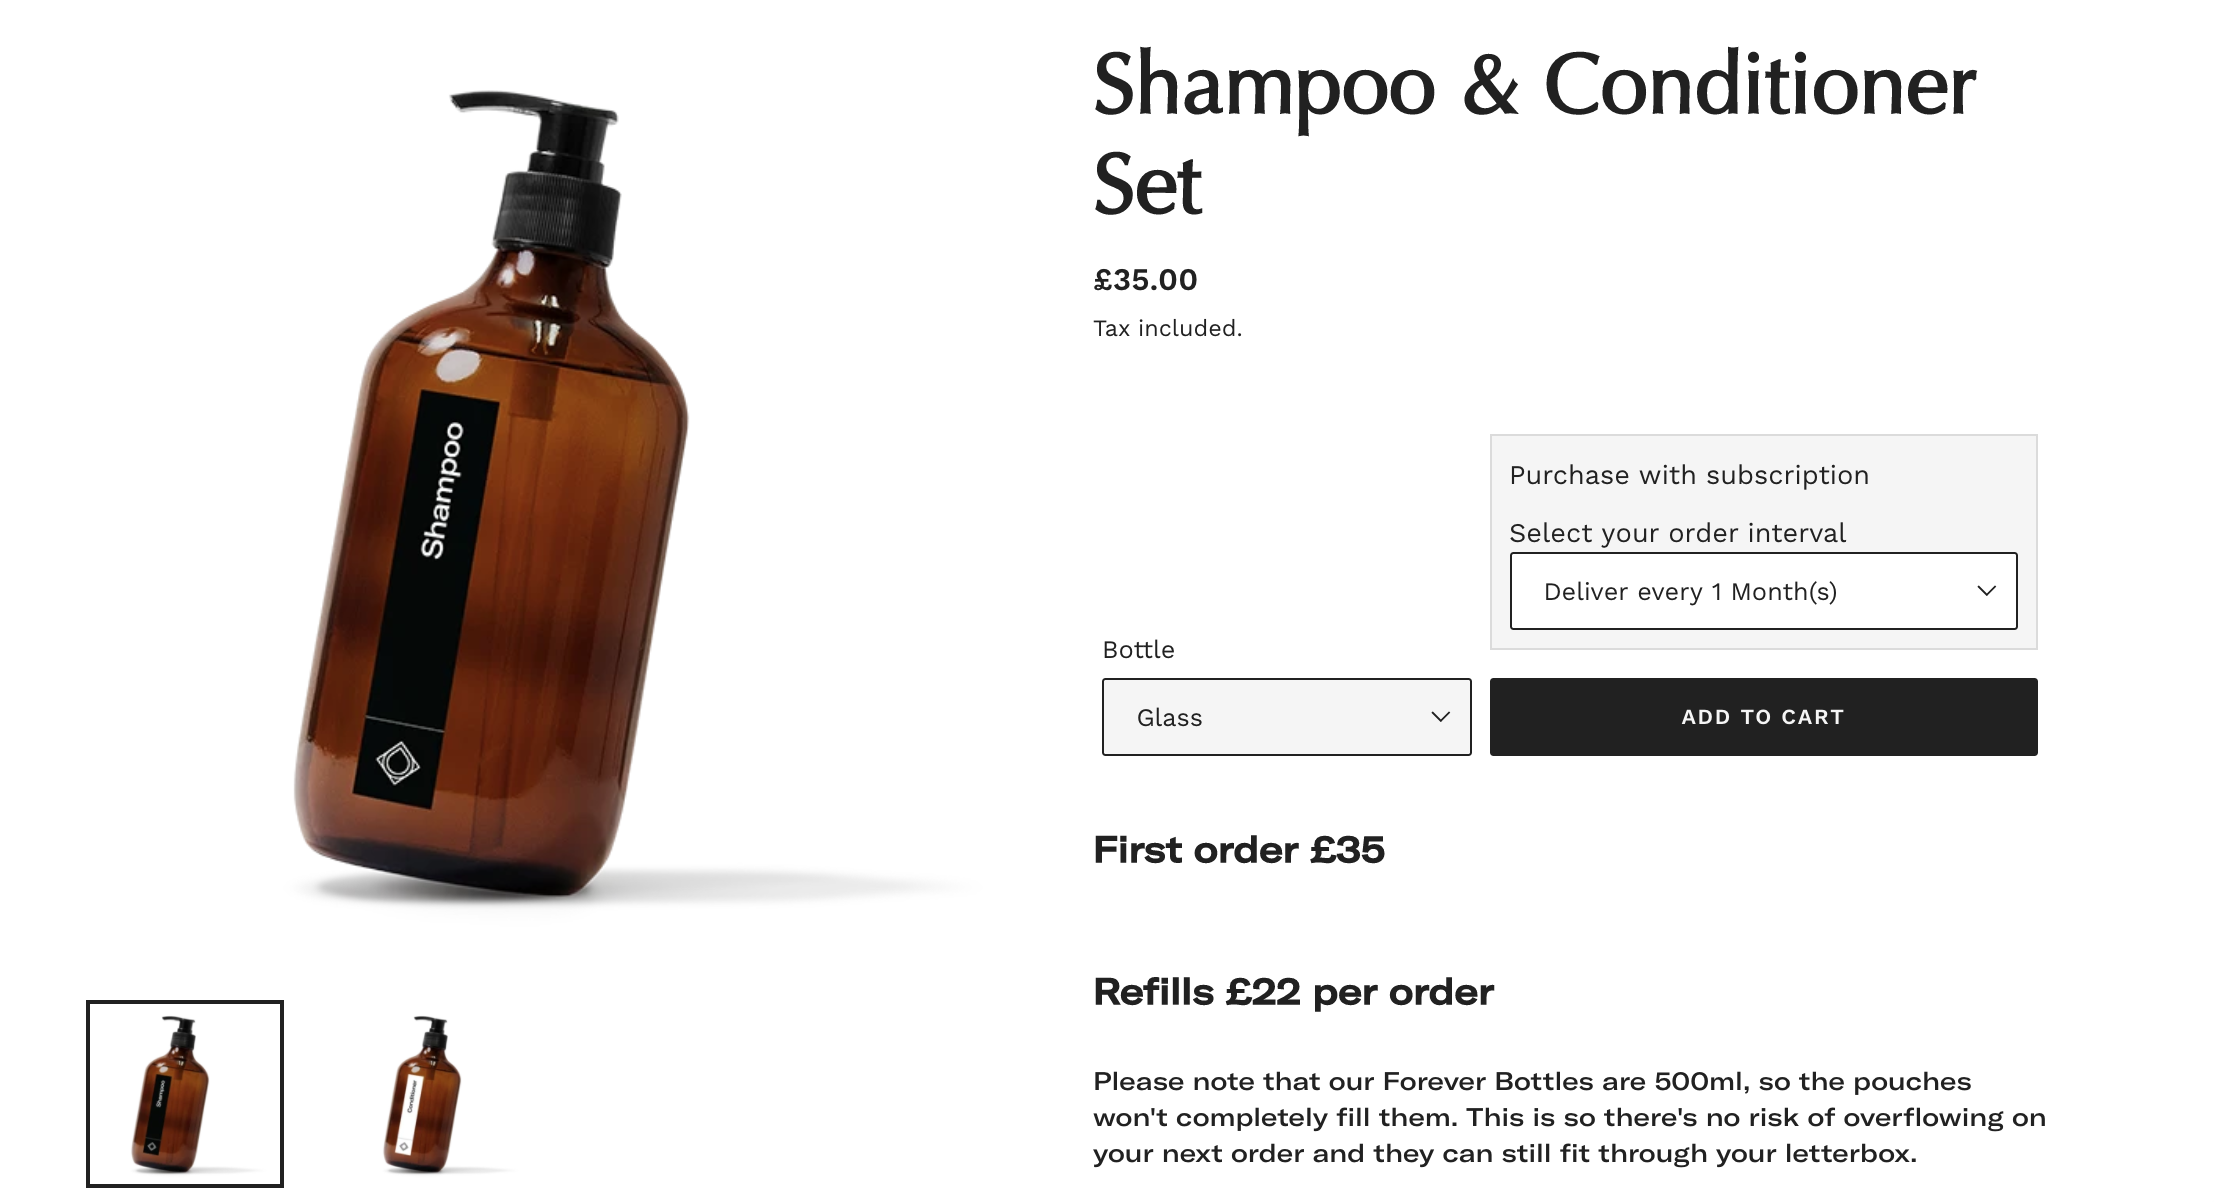 shampoo-convertible-subscription